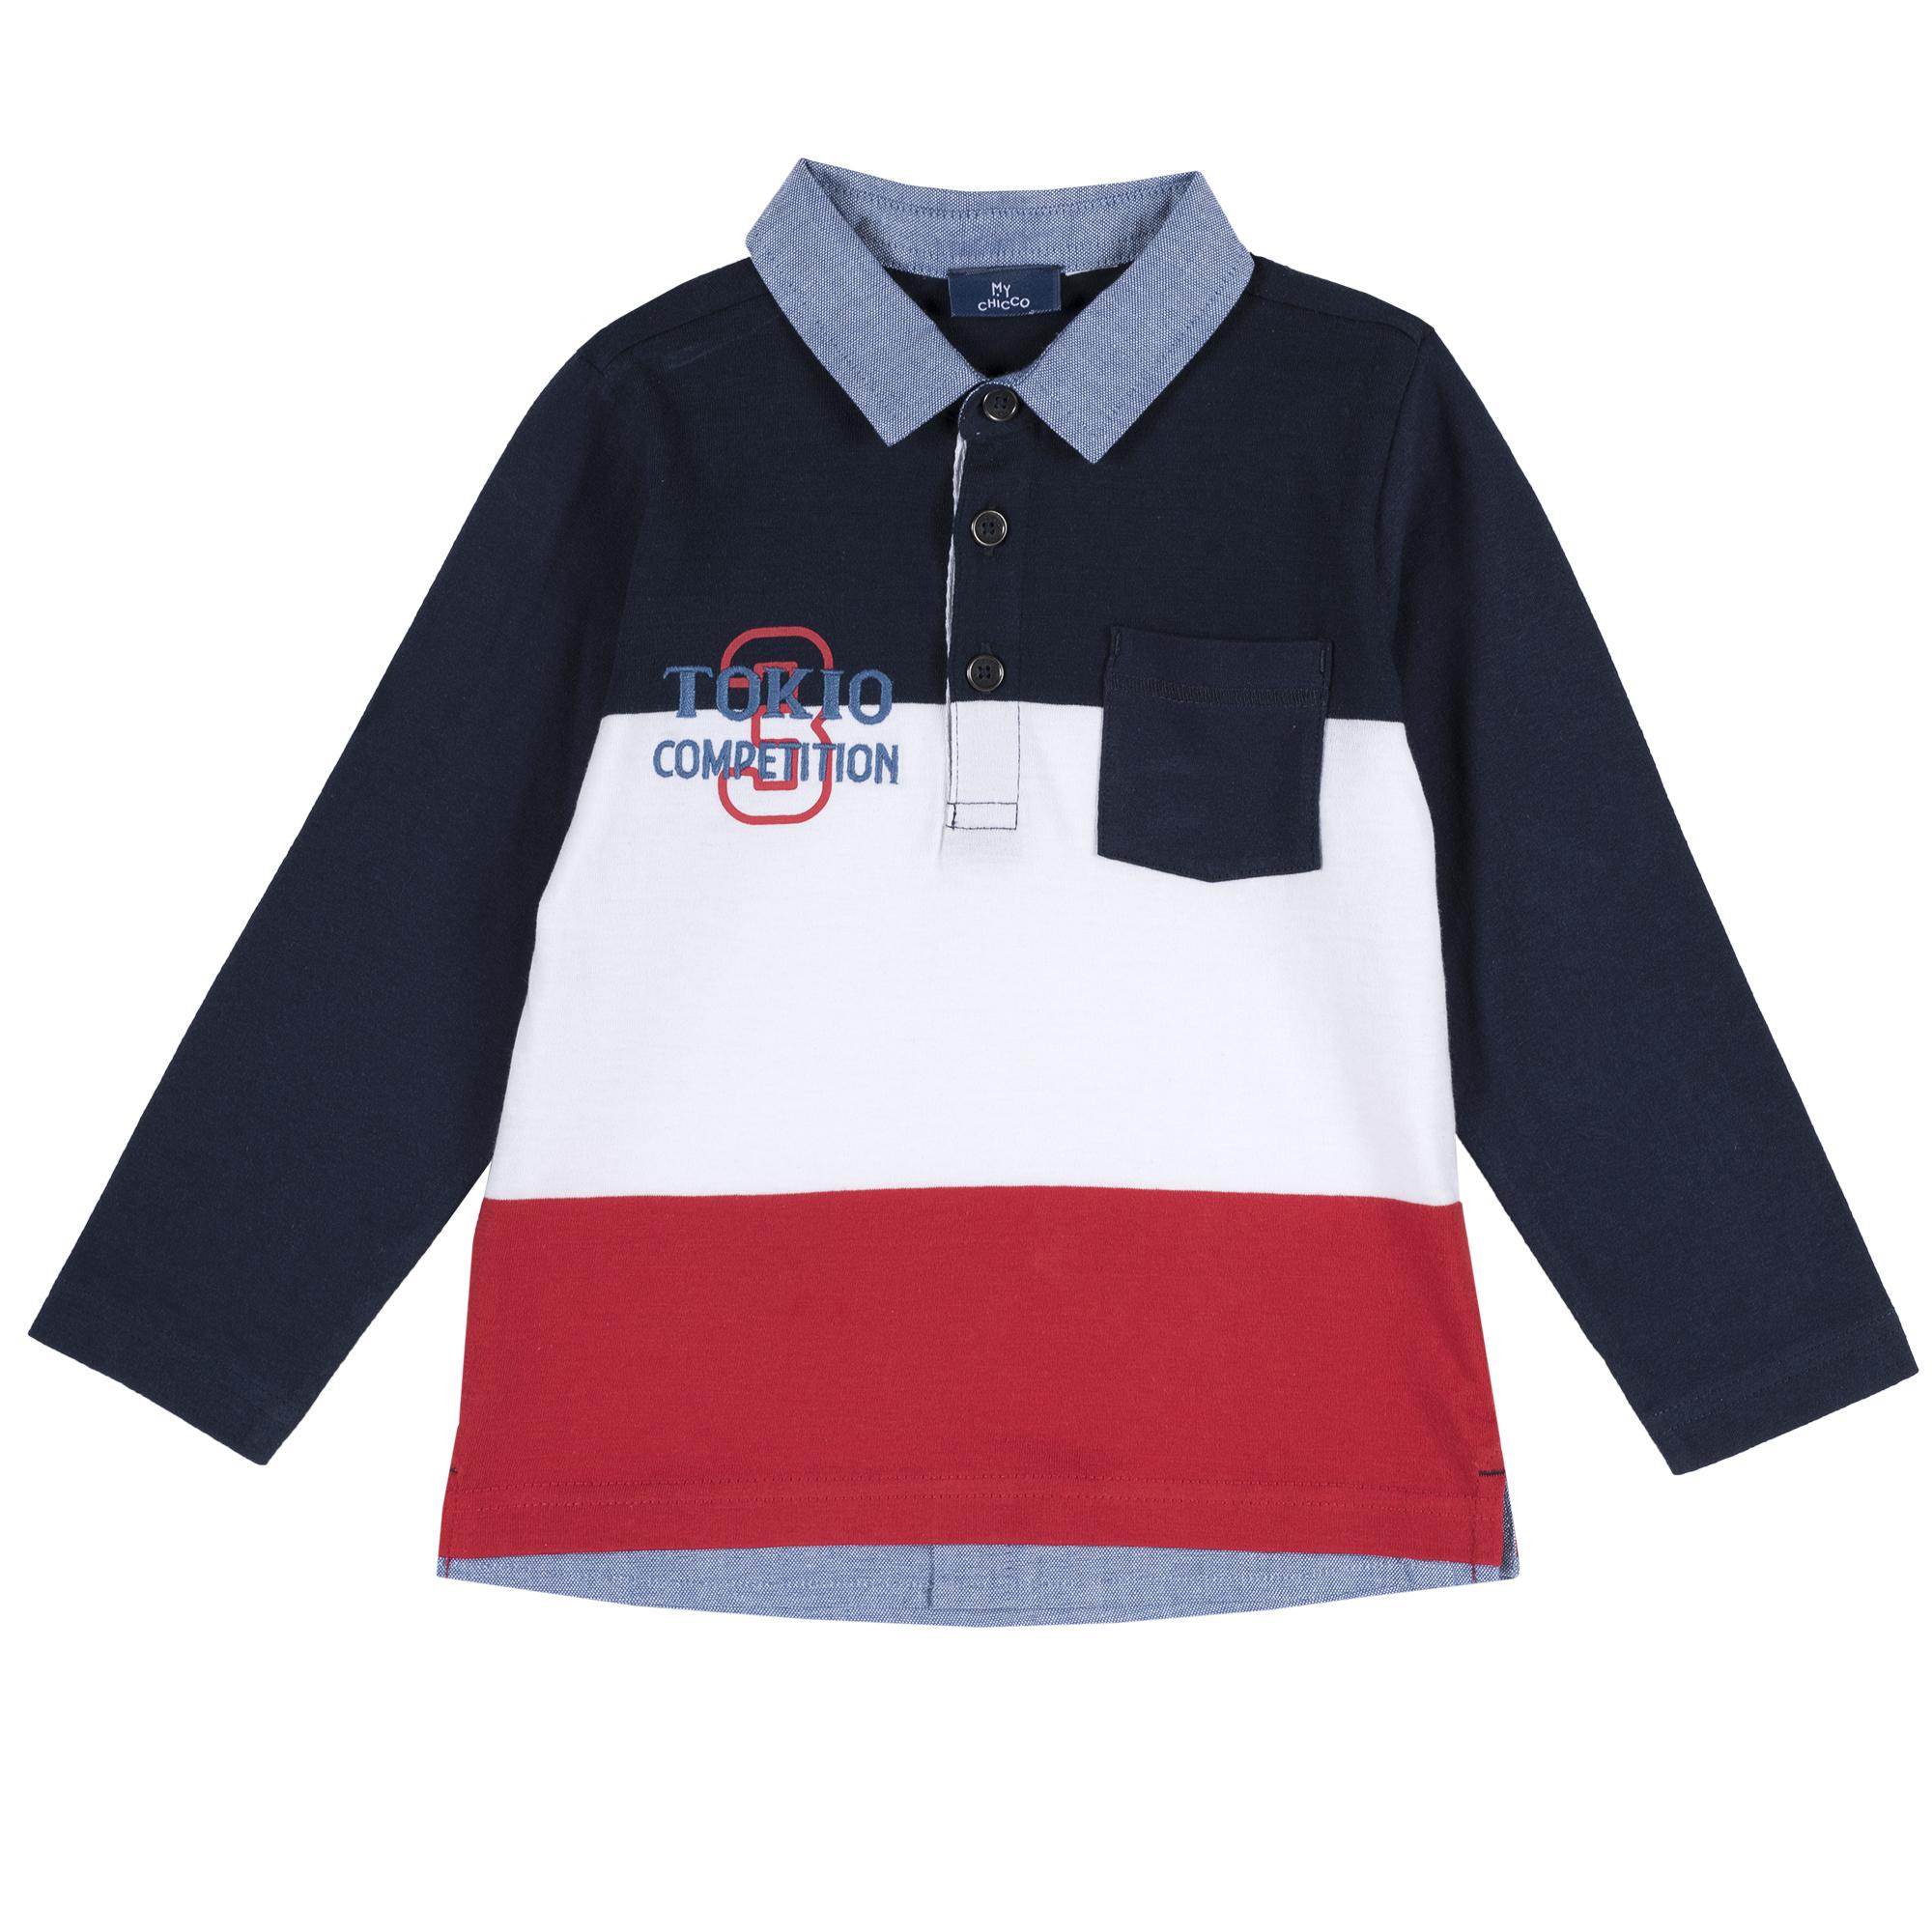 Tricou polo copii Chicco, maneca lunga, albastru inchis, 33487 din categoria Tricouri copii